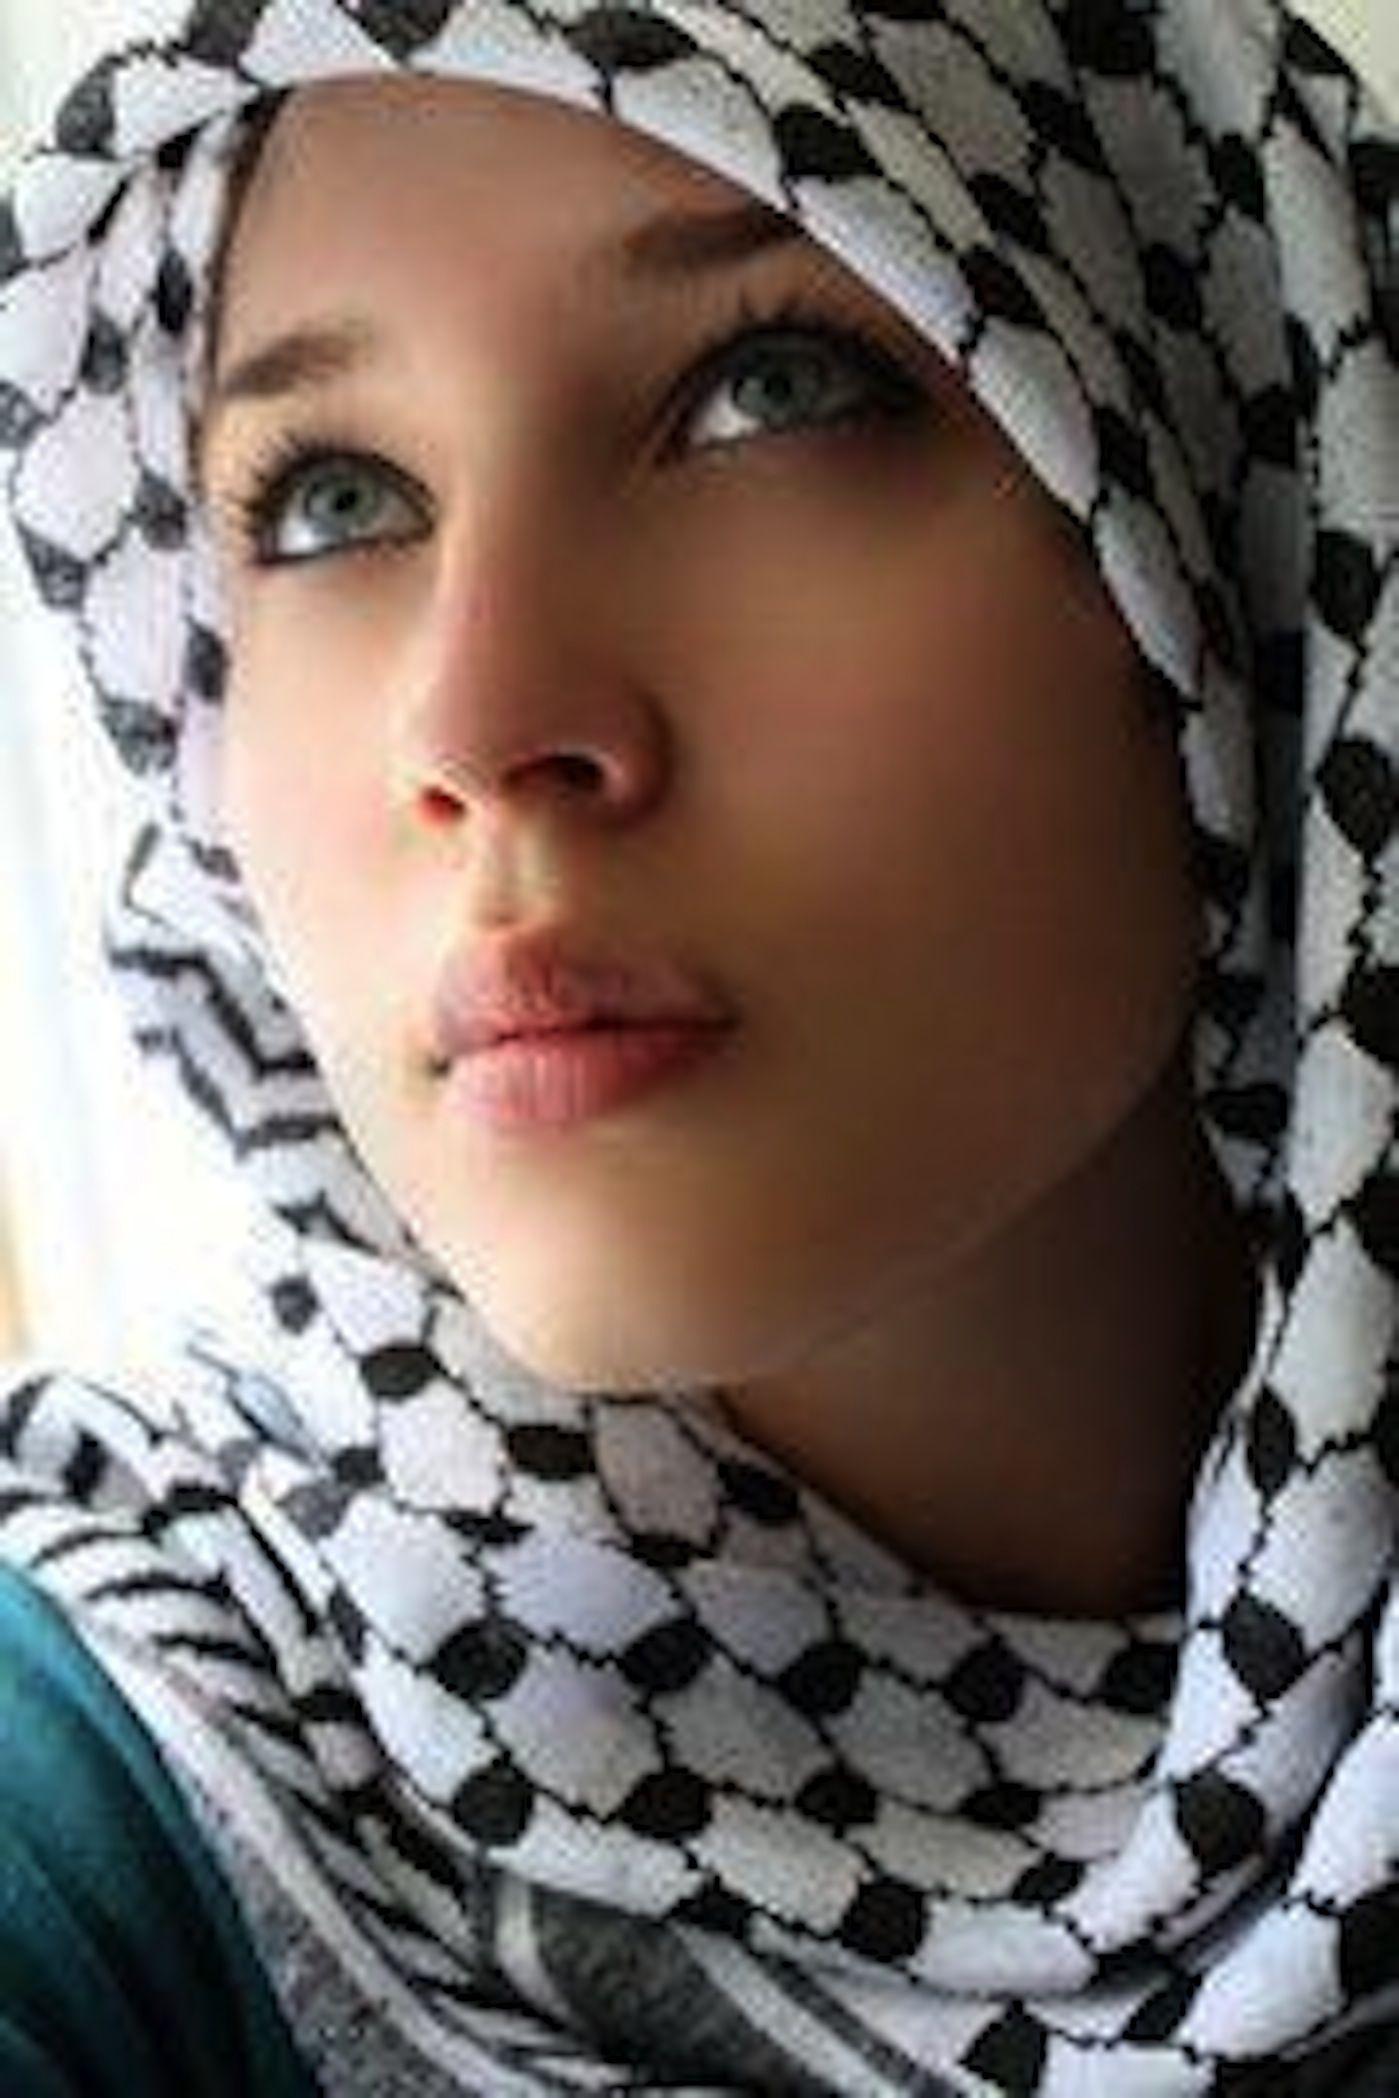 minaj-palestinian-beautiful-women-cock-gifs